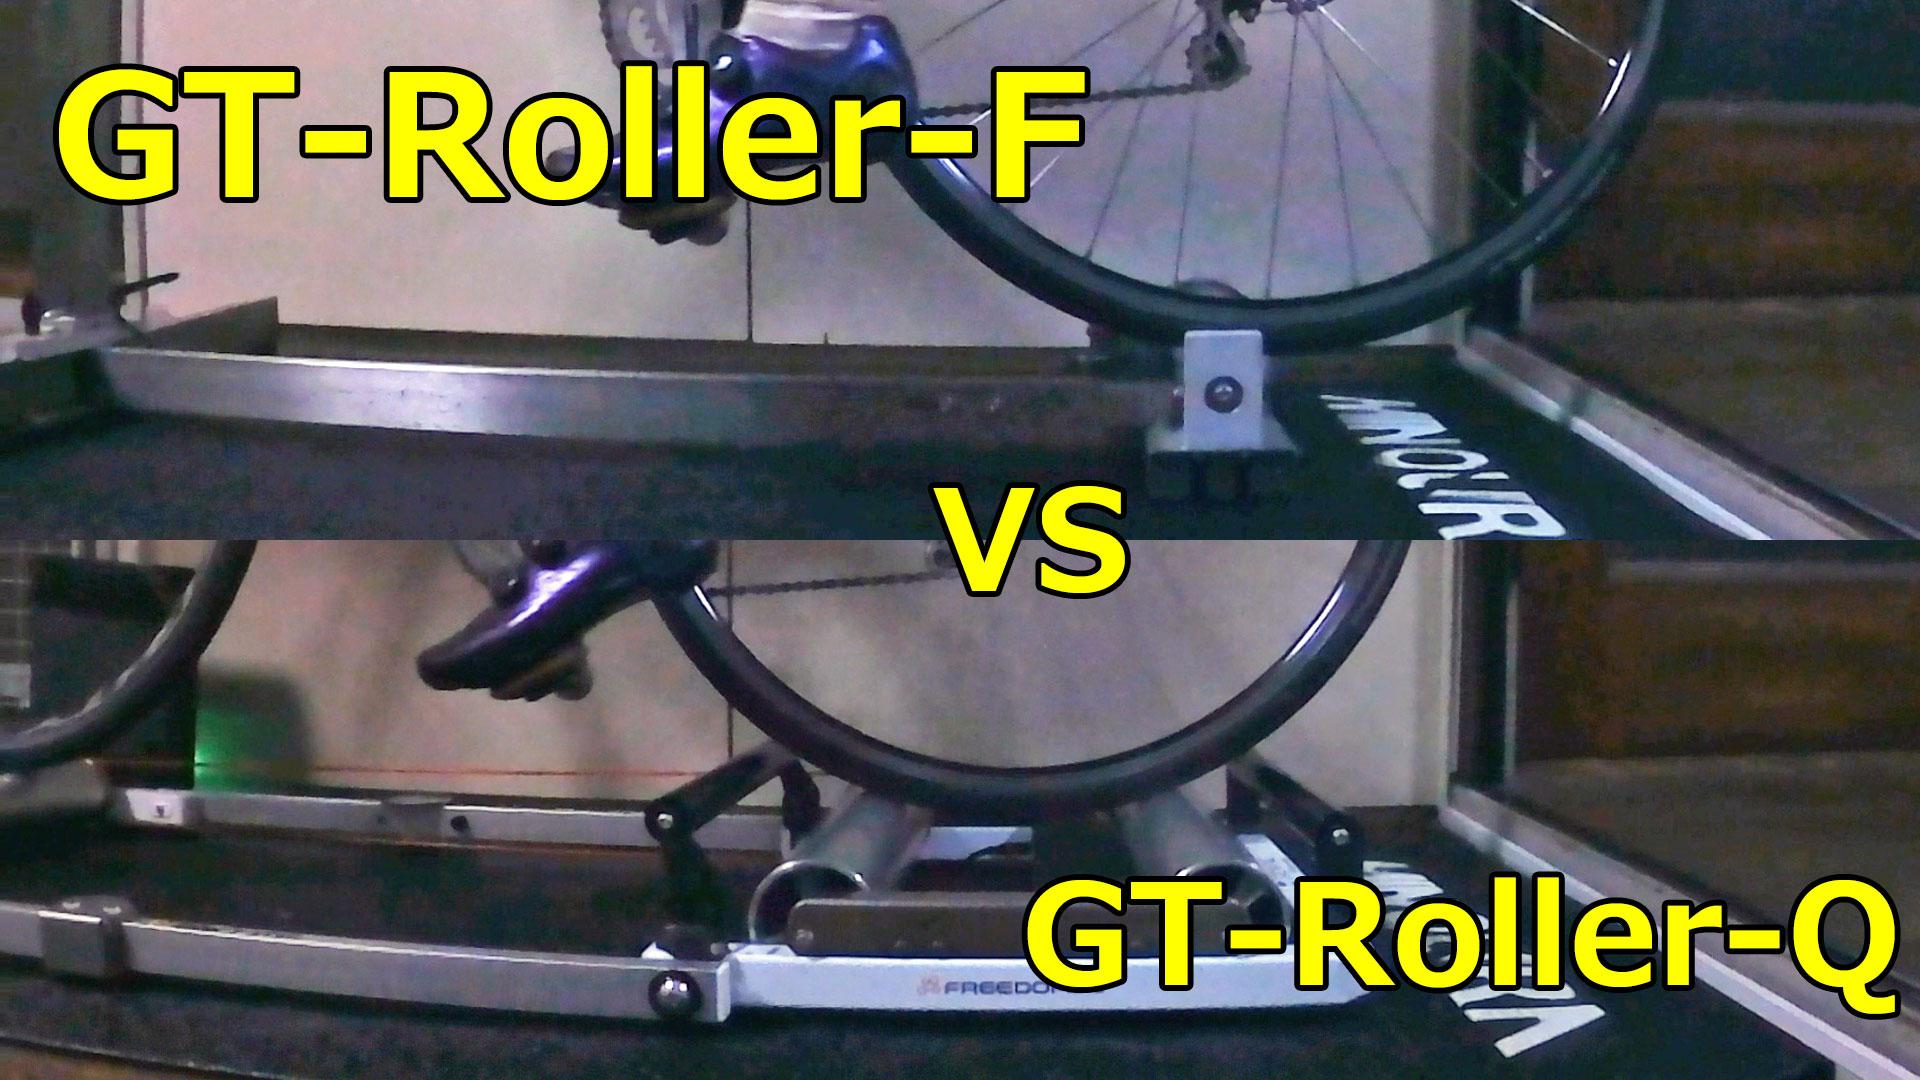 GT-Roller-FとGT-Roller-Q